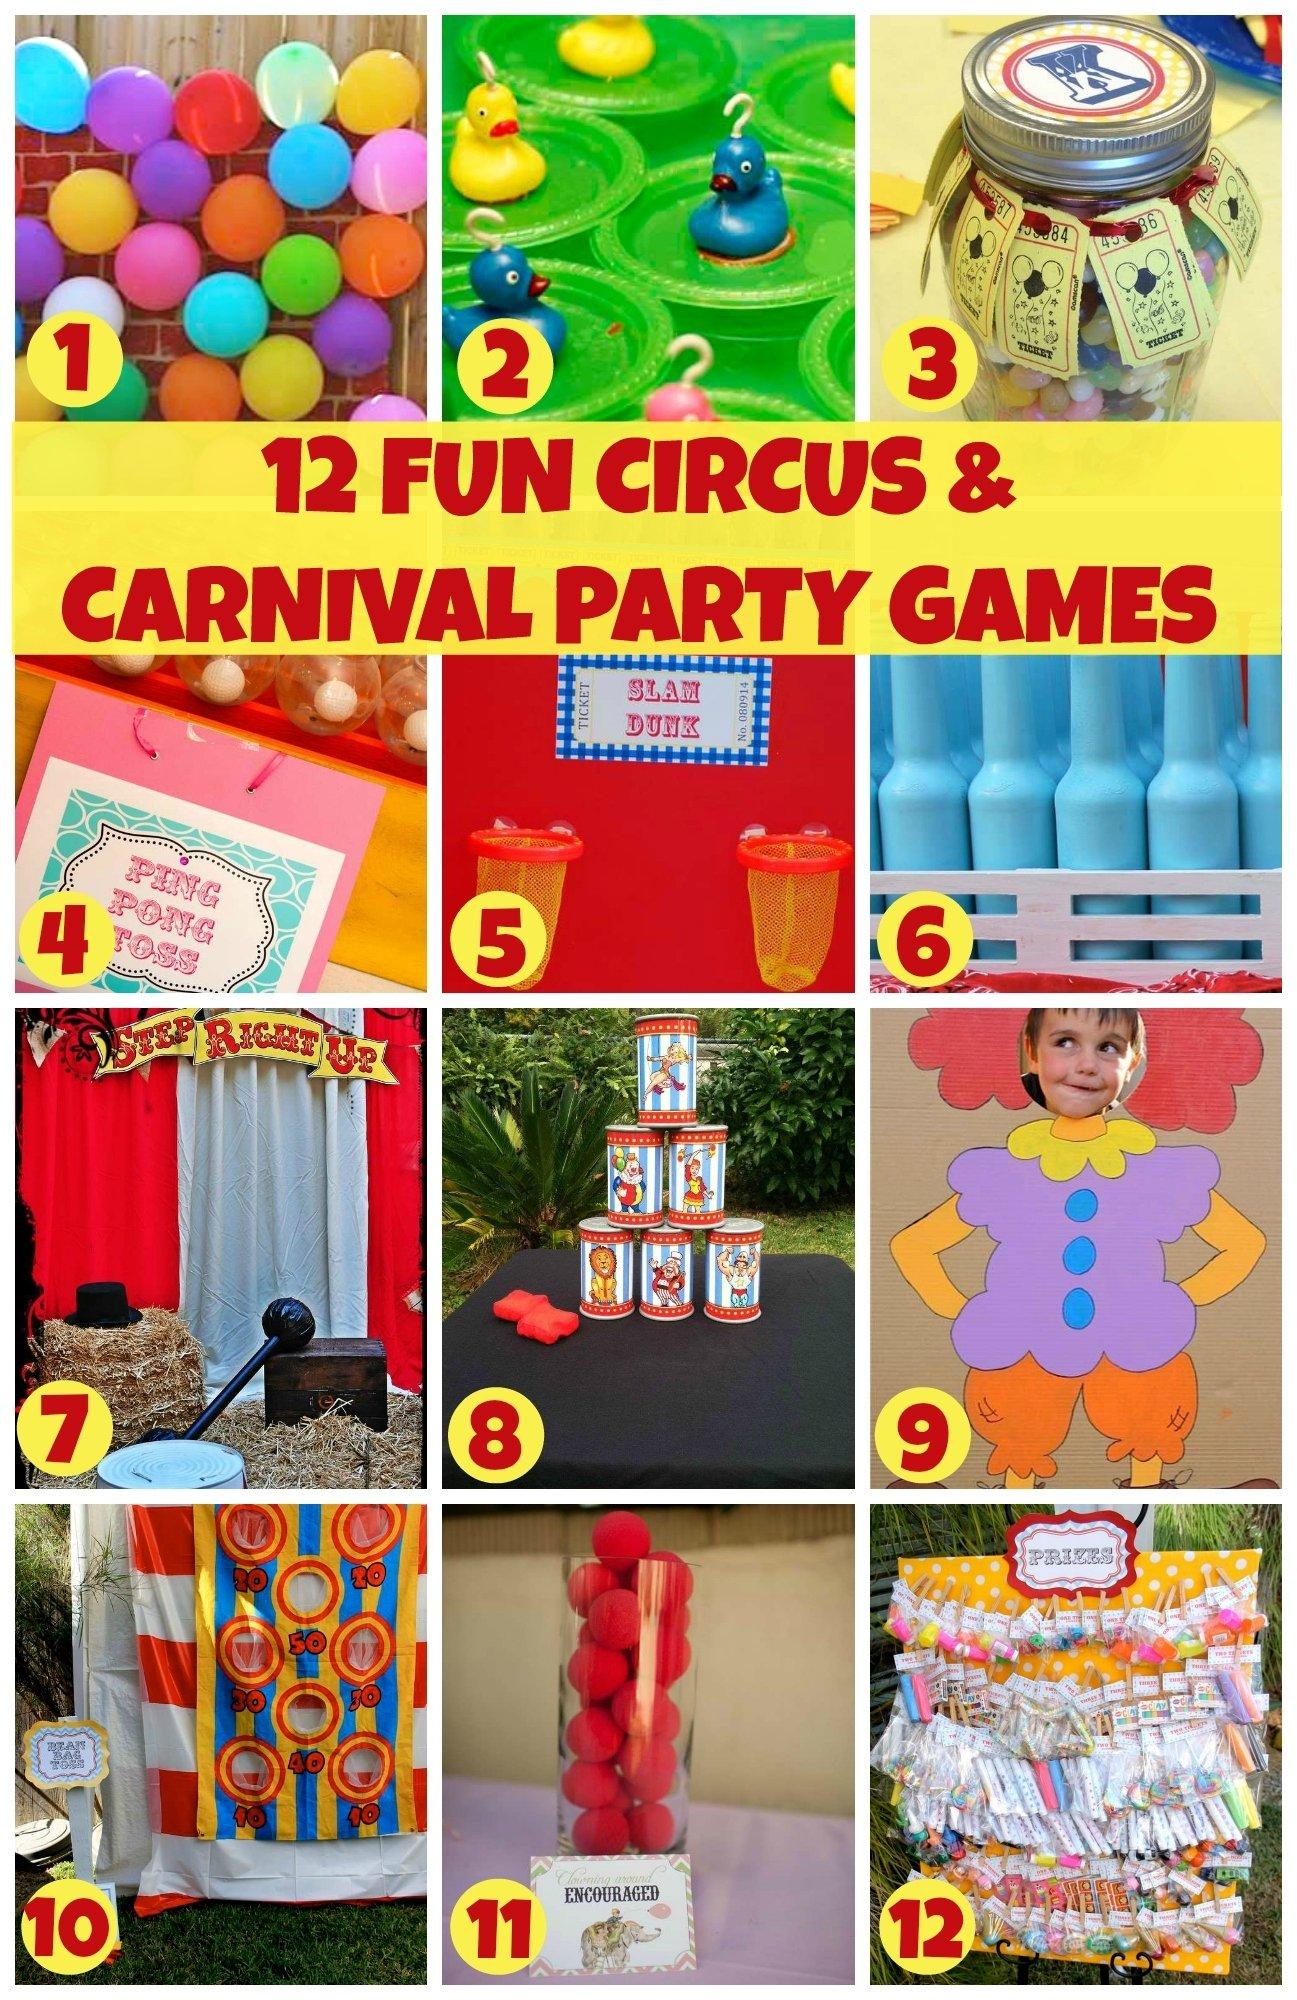 10 Unique Carnival Party Ideas For Kids 12 fun circus carnival party games catch my party 17 2021